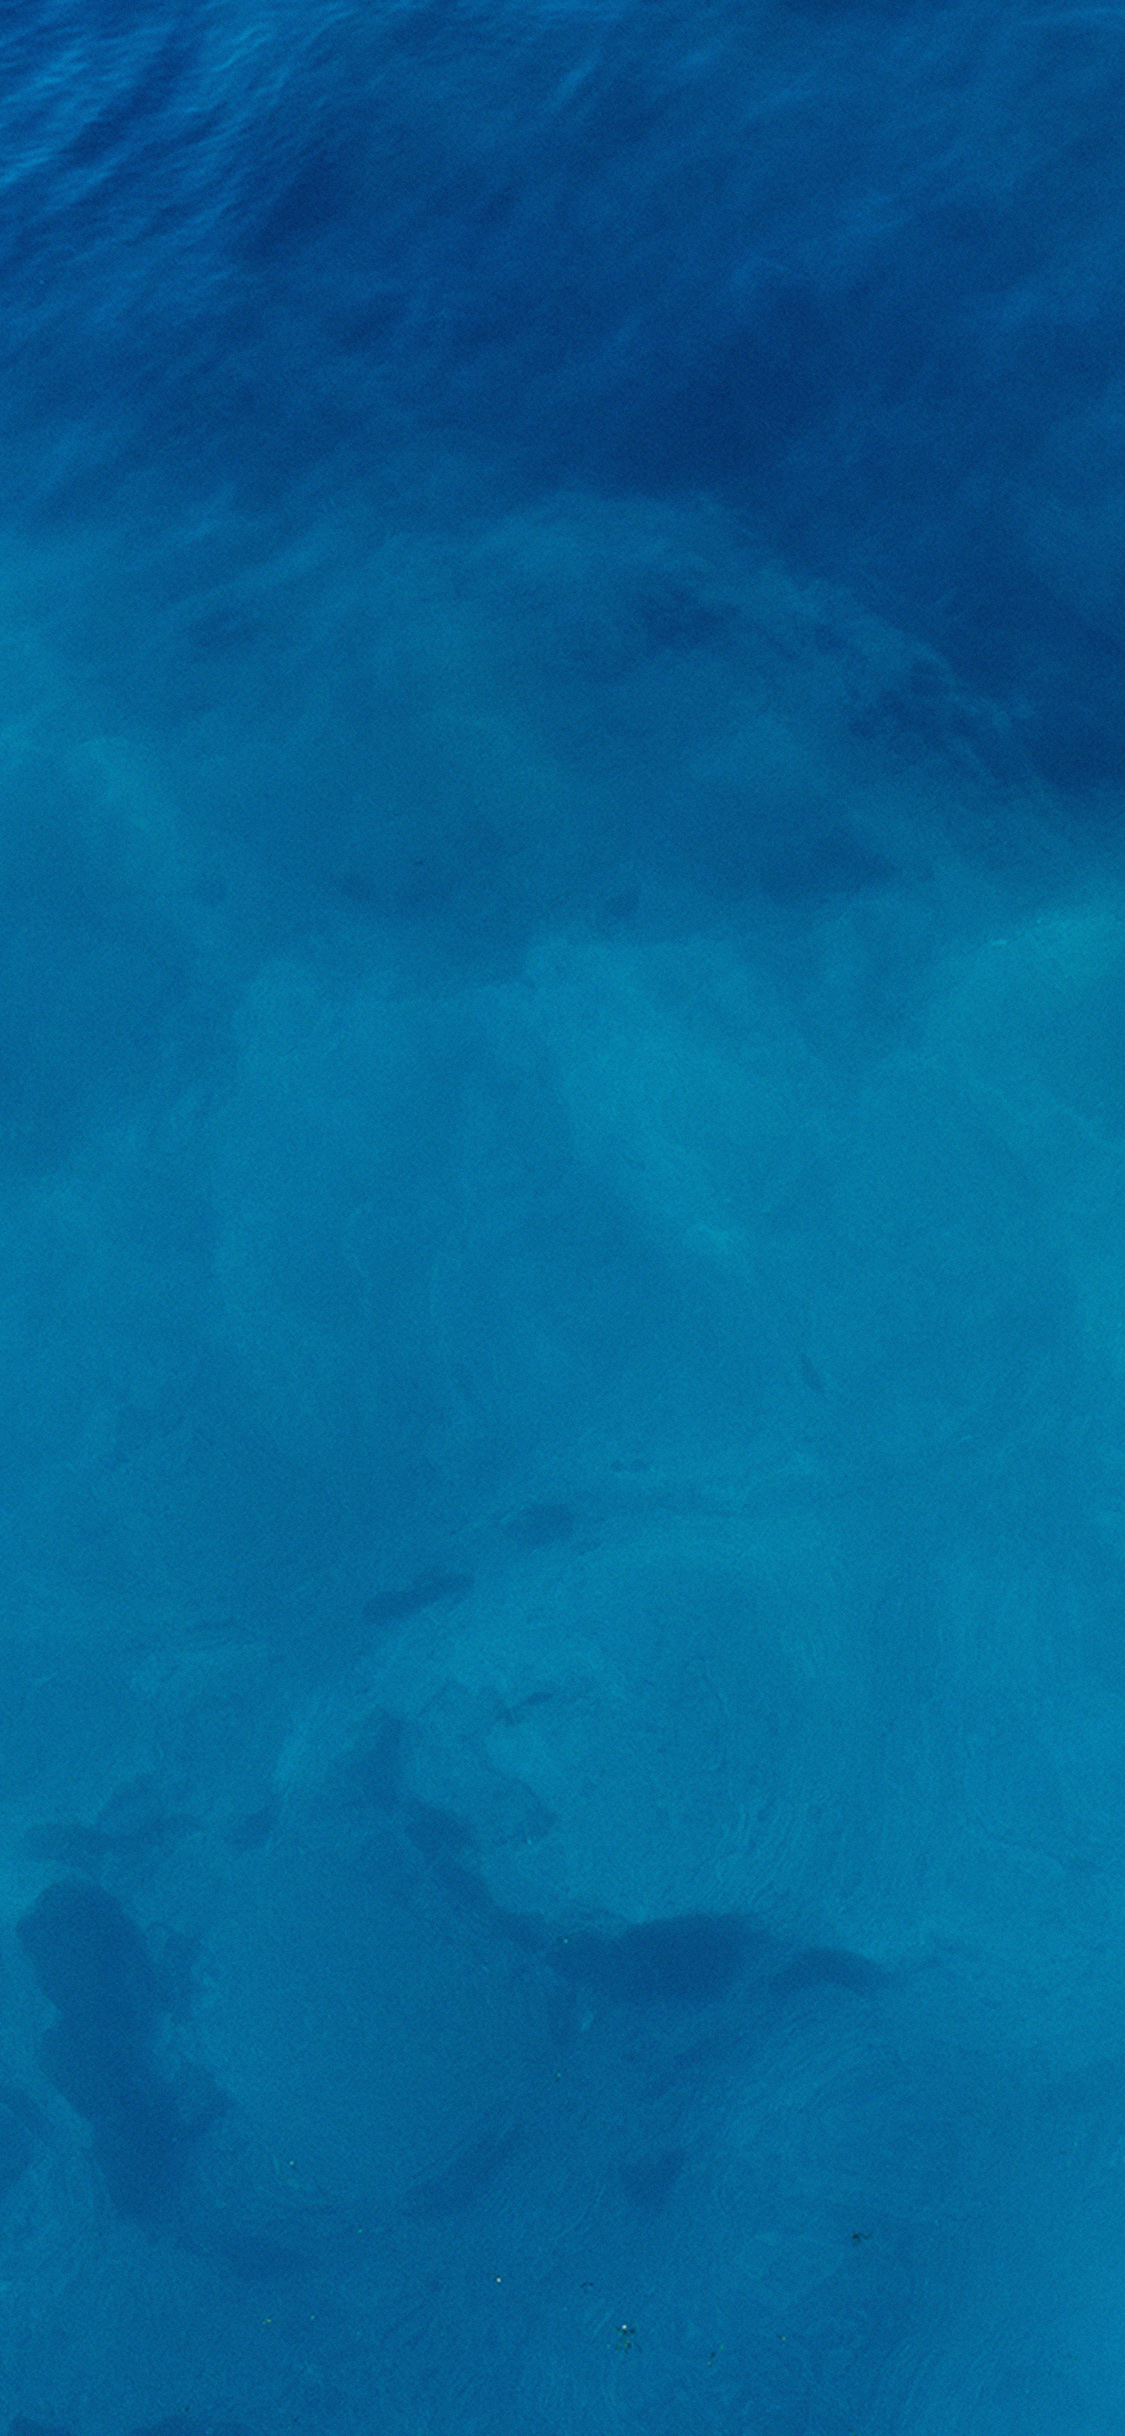 Iphone - Wallpaper ocean blue ...